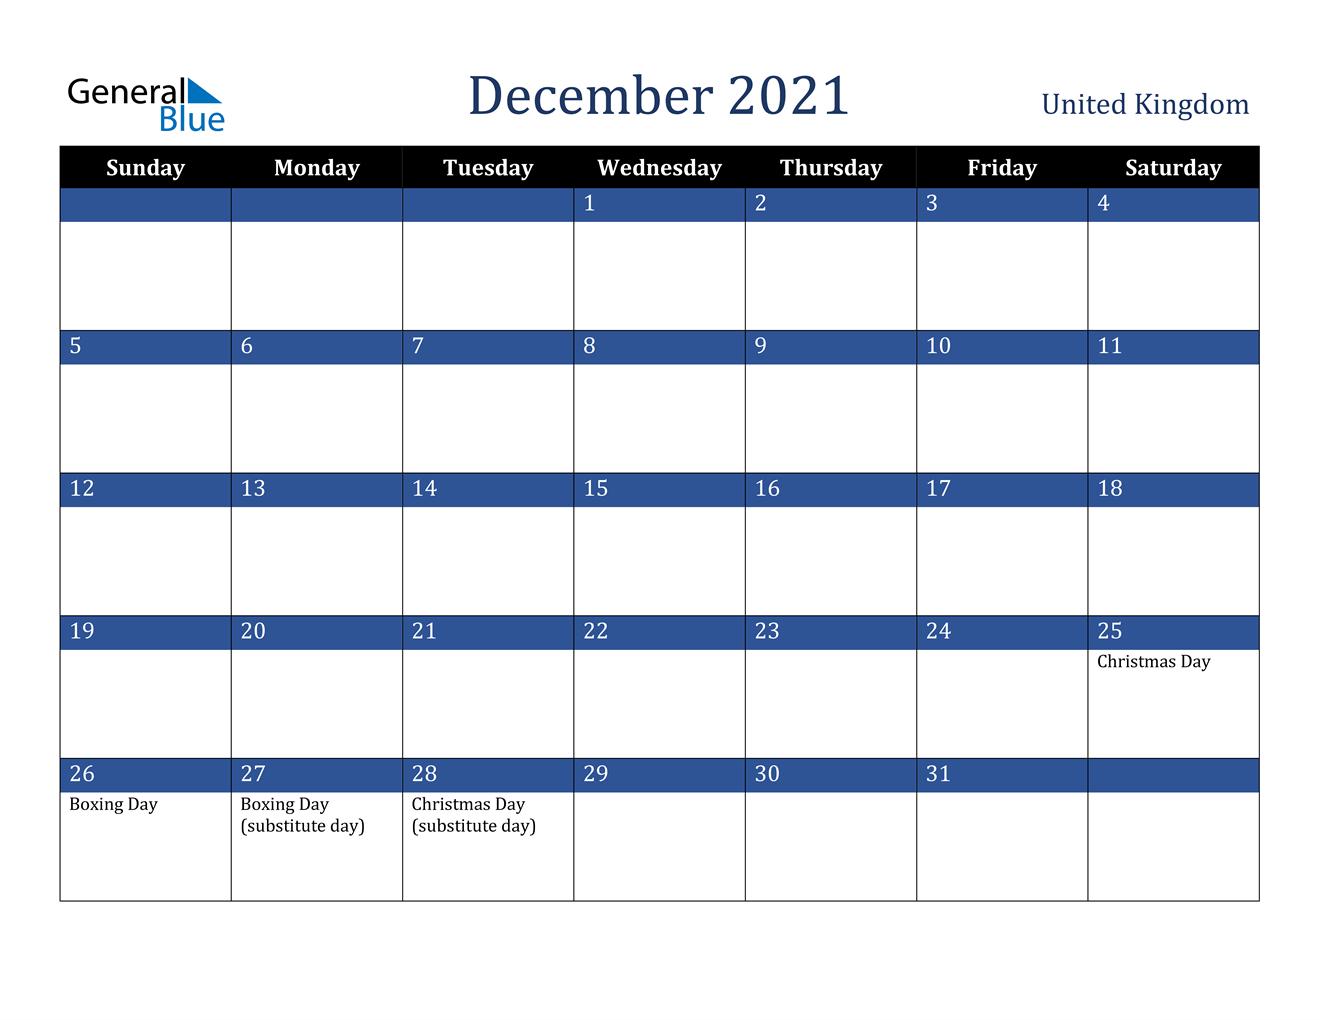 December 2021 Calendar - United Kingdom